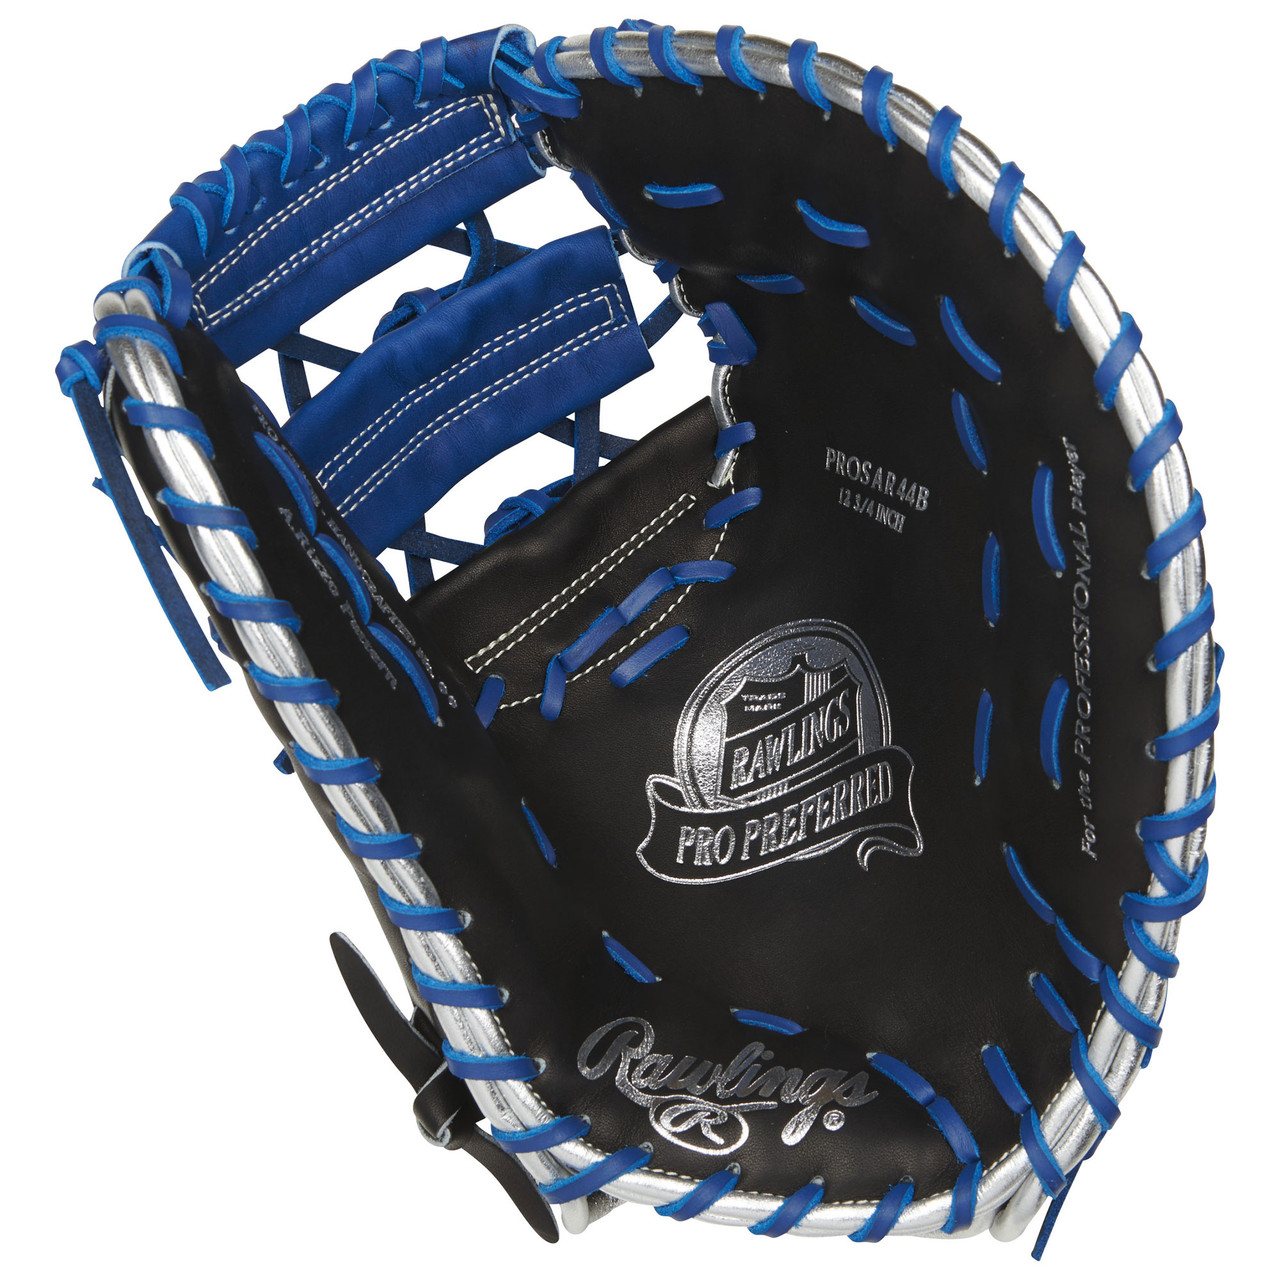 Rawlings Pro Preferred Rizzo 12.75 Inch PROSAR44B Baseball First Base Mitt